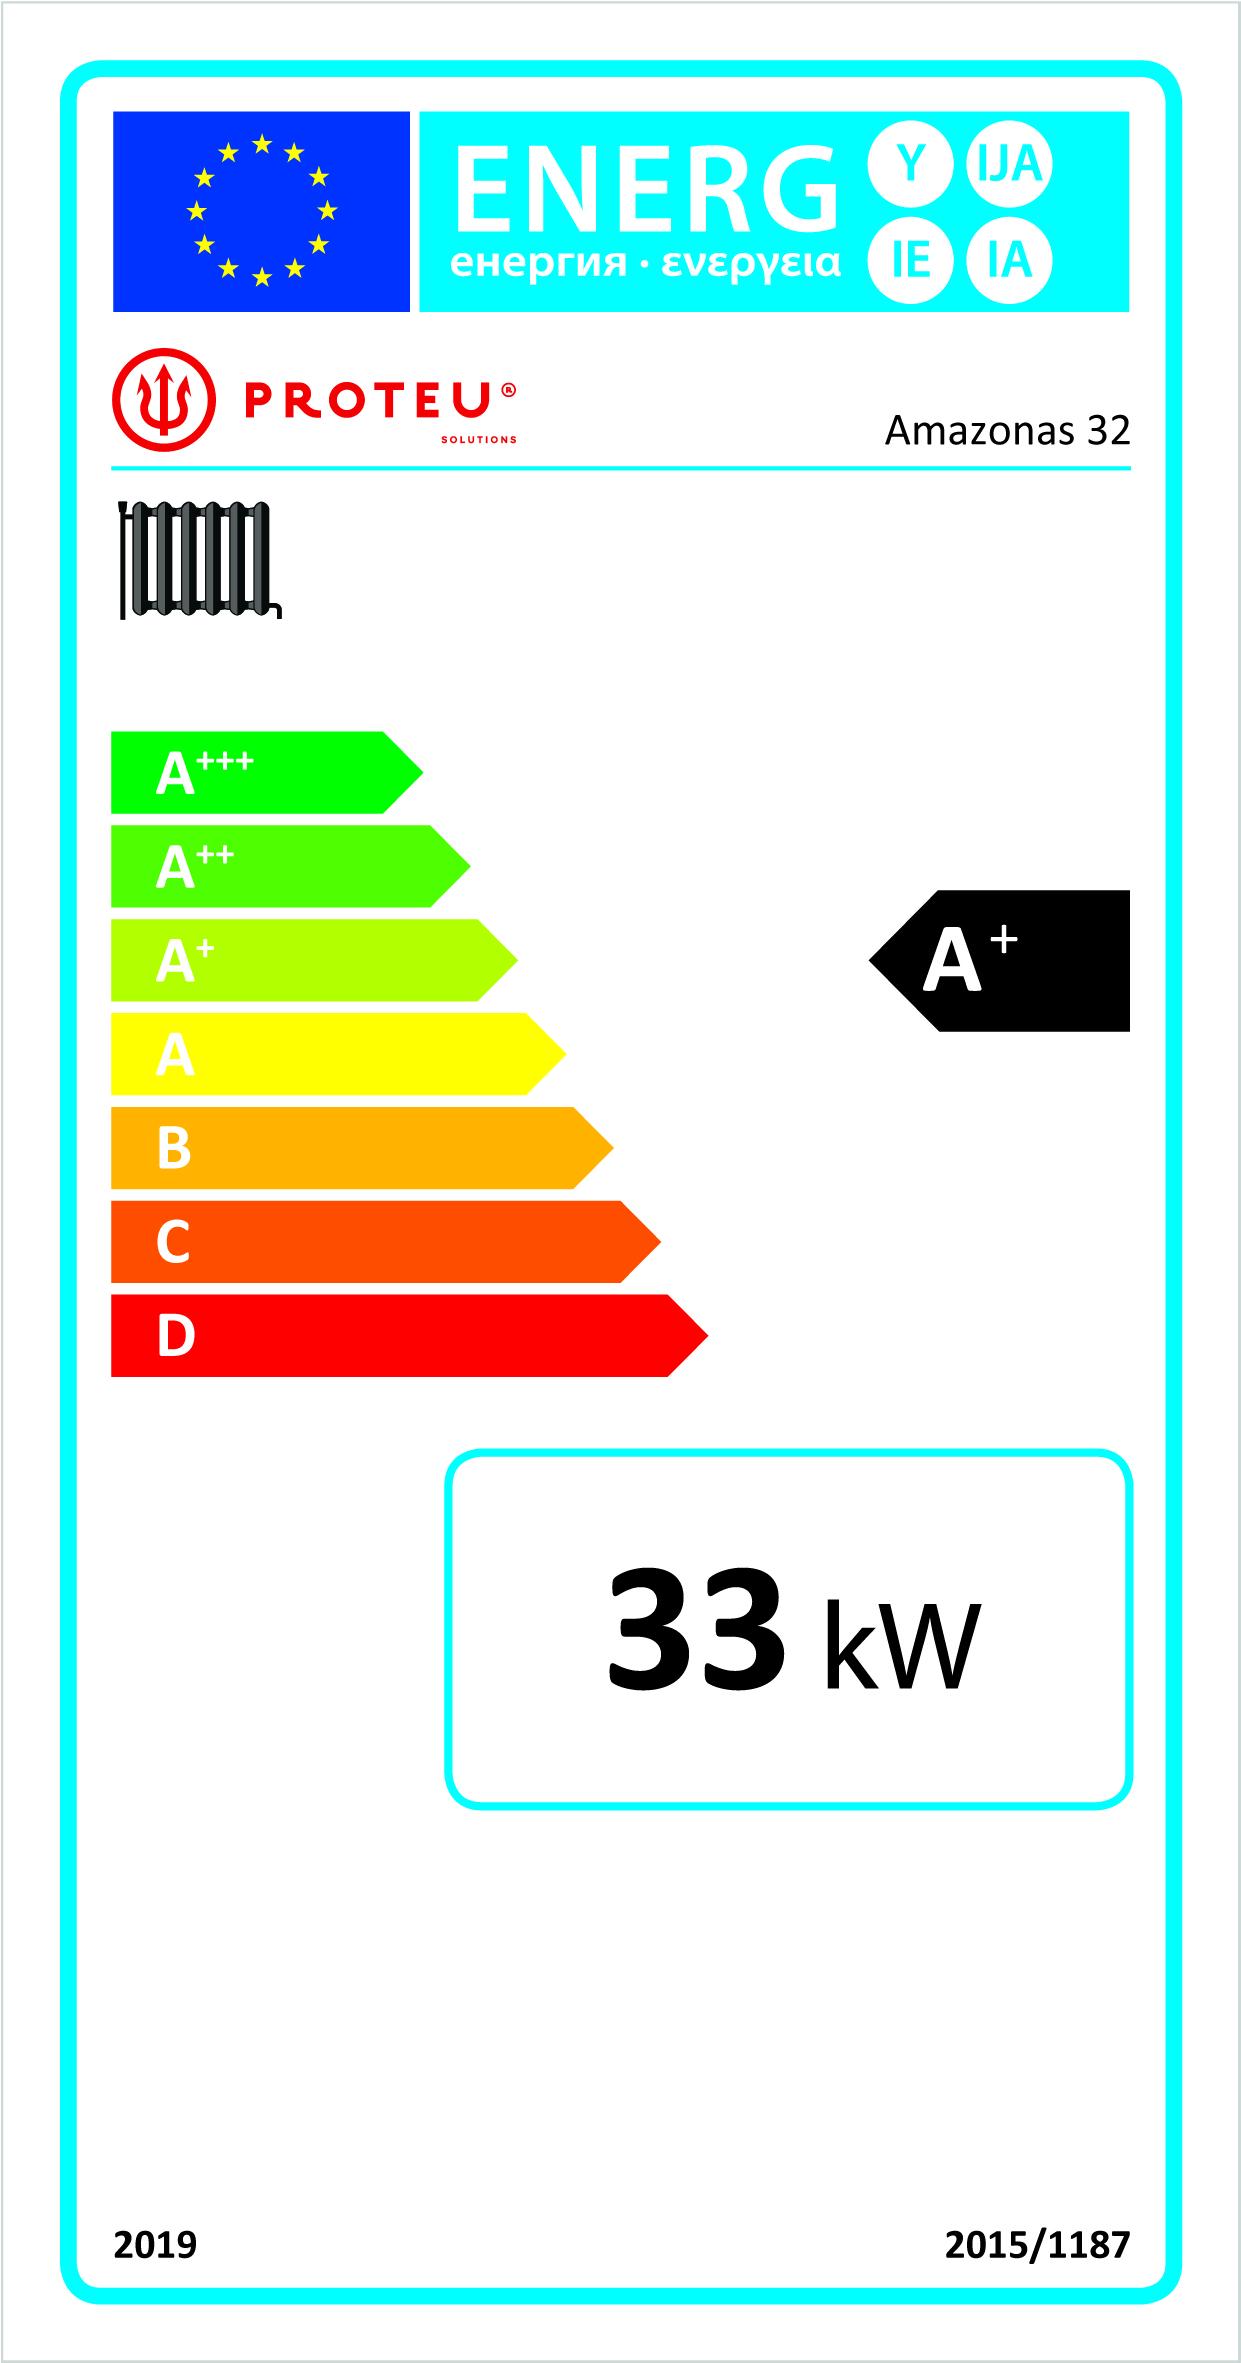 Etiqueta energética amazonas 32